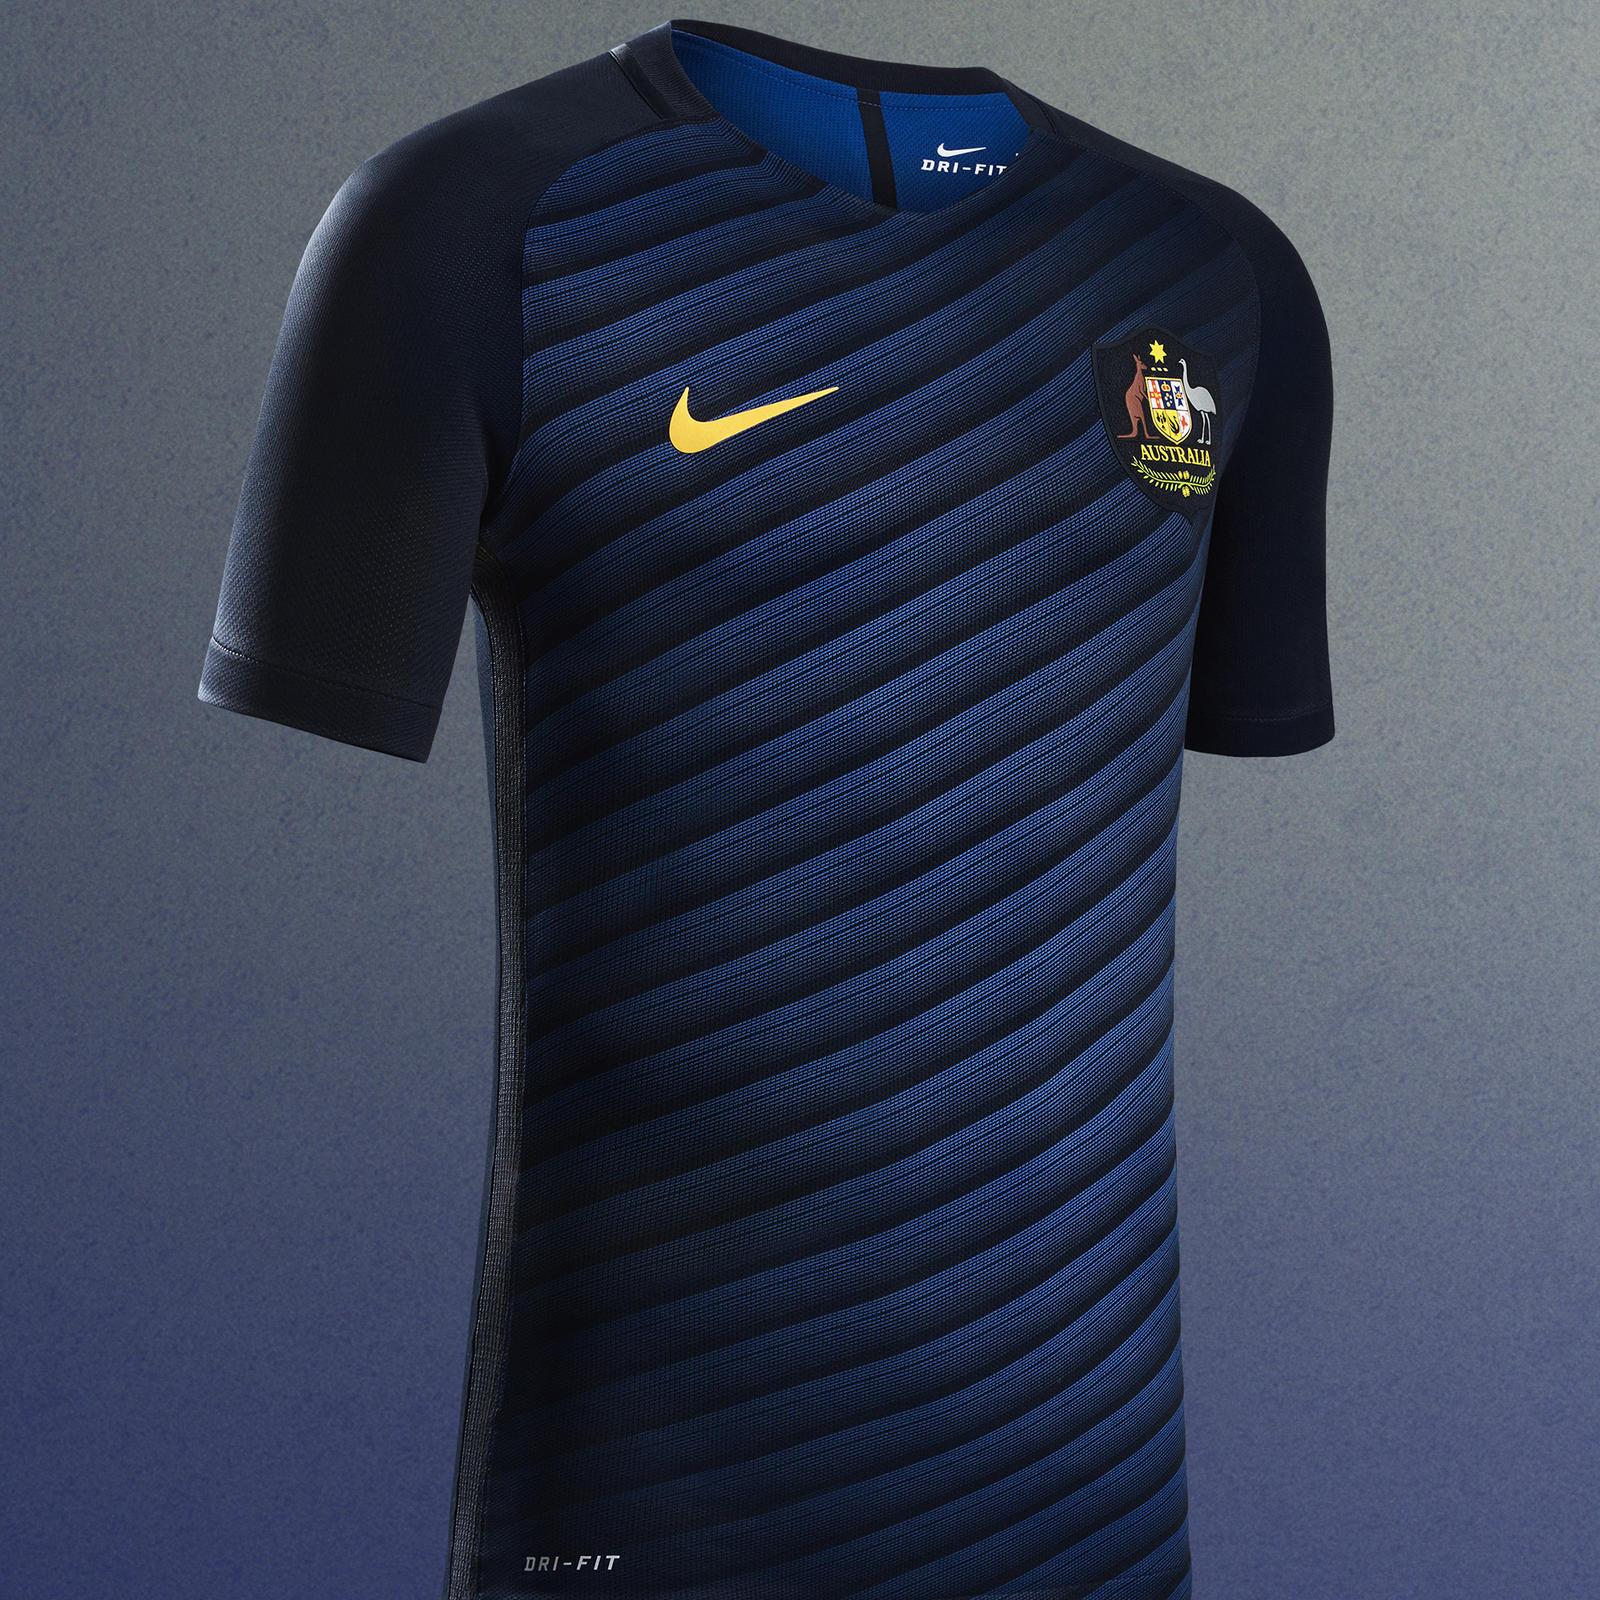 6f1d9863aaf Australia 2016 National Football Kits - Nike News